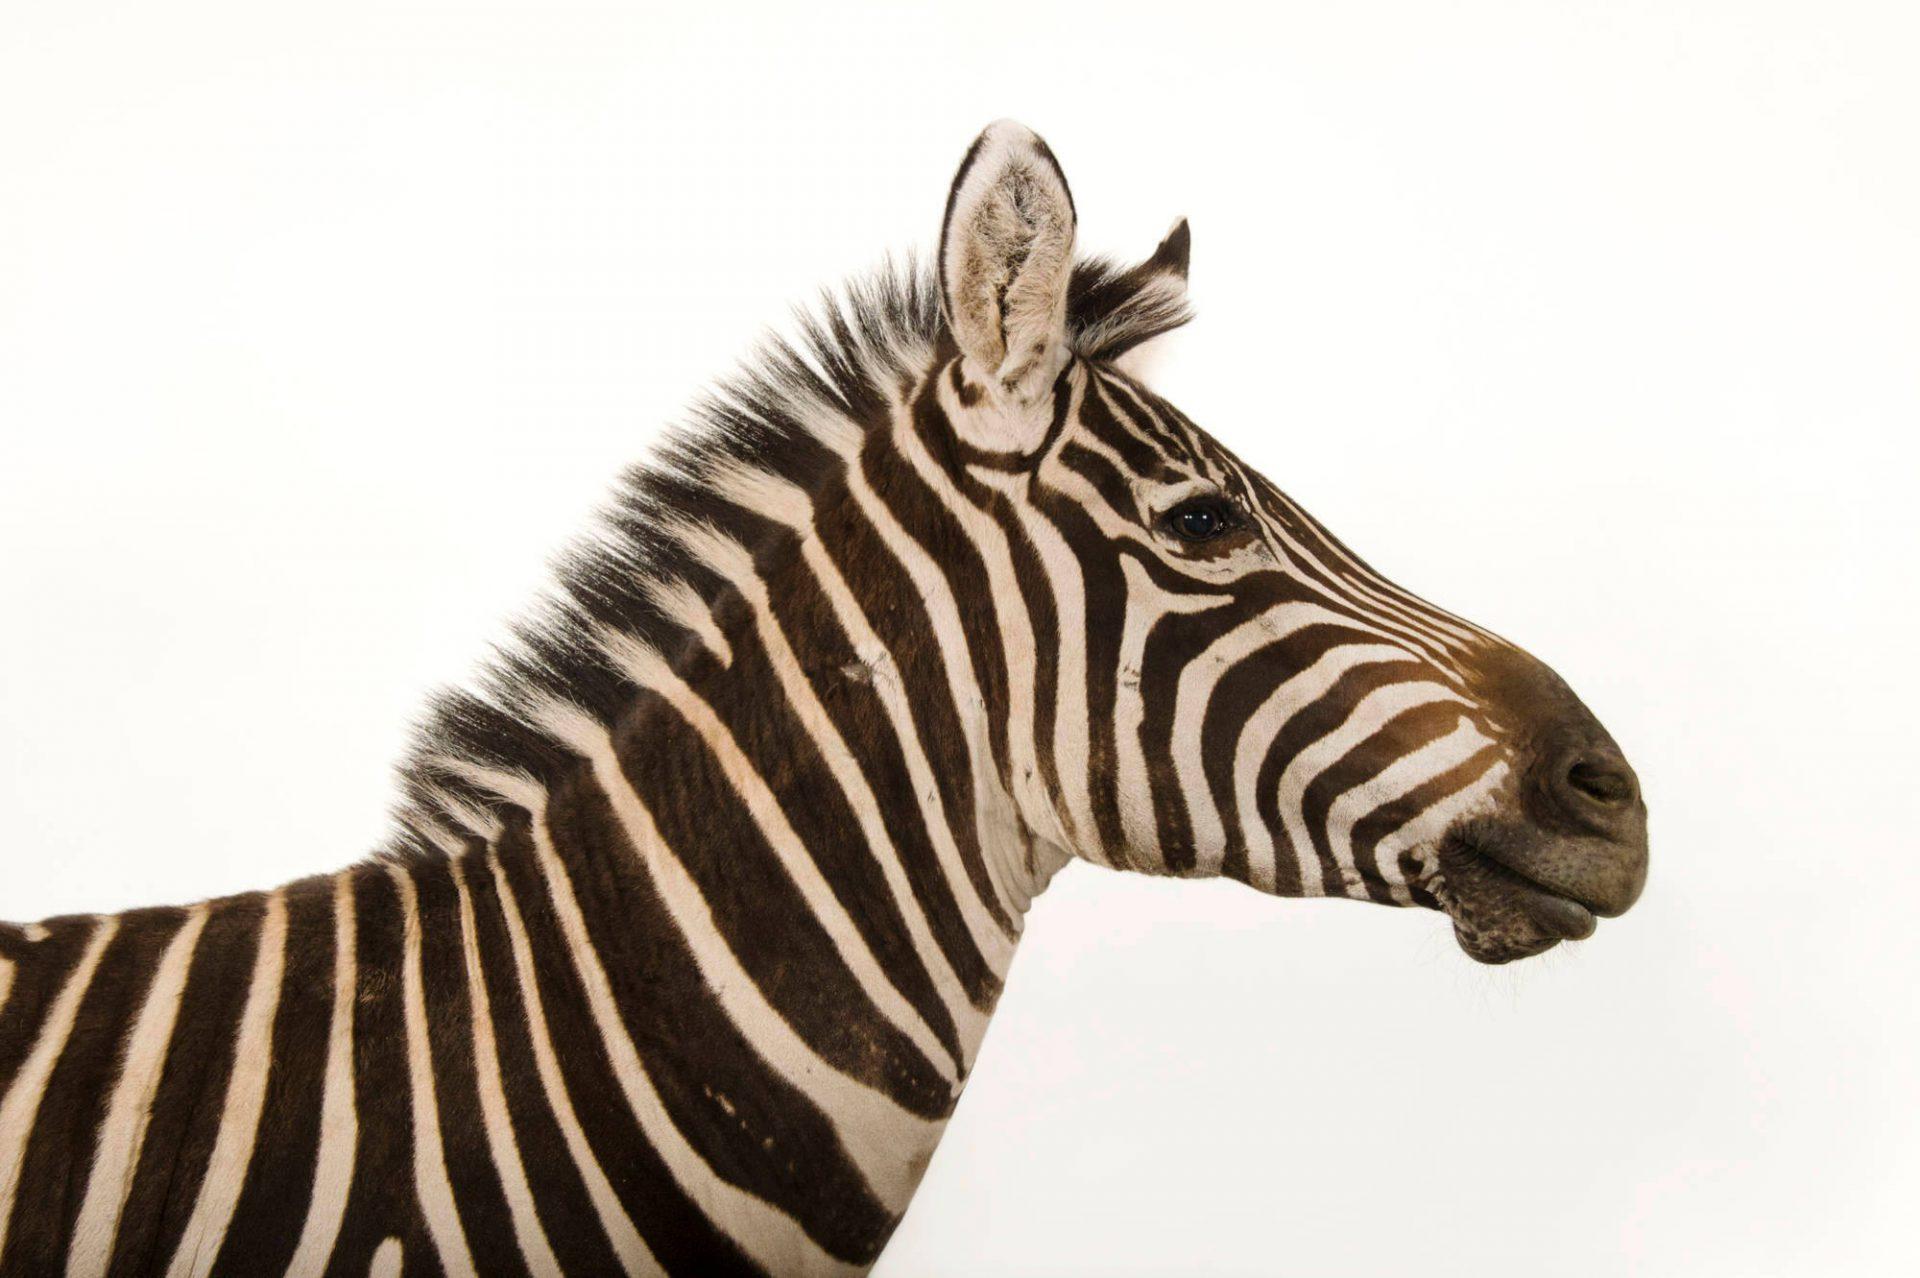 A Grant's zebra (Equus quagga boehmi) named Mugambi, which means 'King' at the Cheyenne Mountain Zoo.